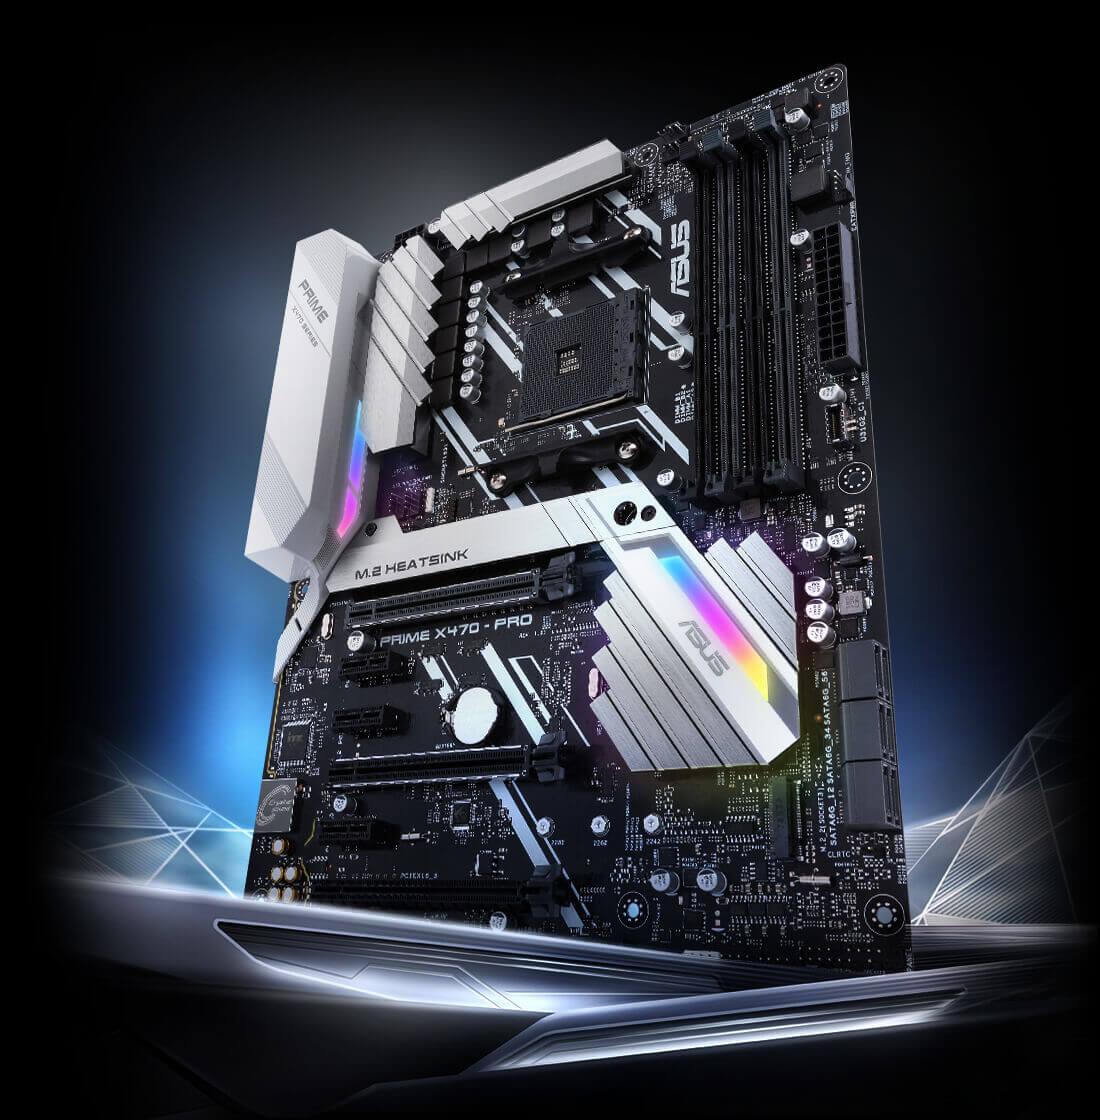 Prime X470 Pro Motherboards Asus Usa Ez Wiring 12 Standard Diagram Cpu Amd Ryzen 7 2700x Dram Kingston Ddr4 2666 8g2 Power Corsair Rm850i Water Cooling H110i